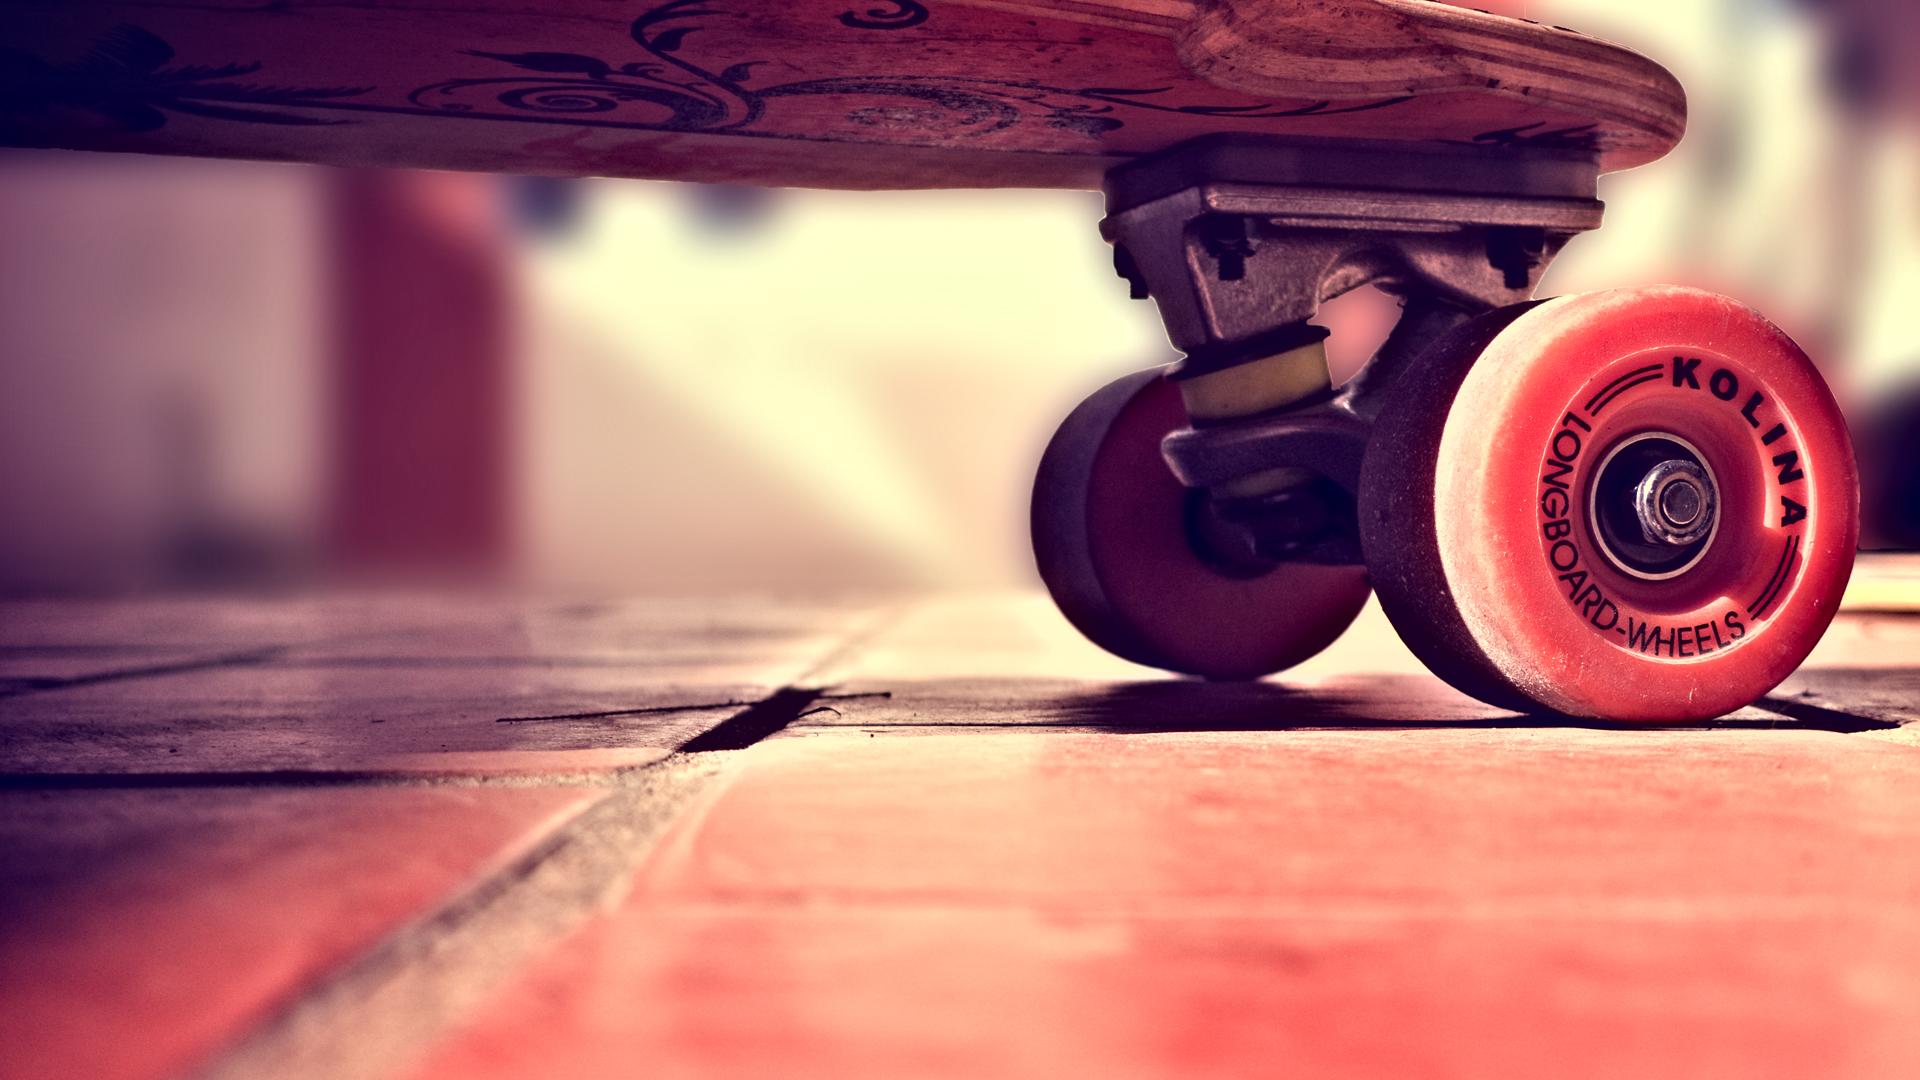 skateboard wallpaper 7547